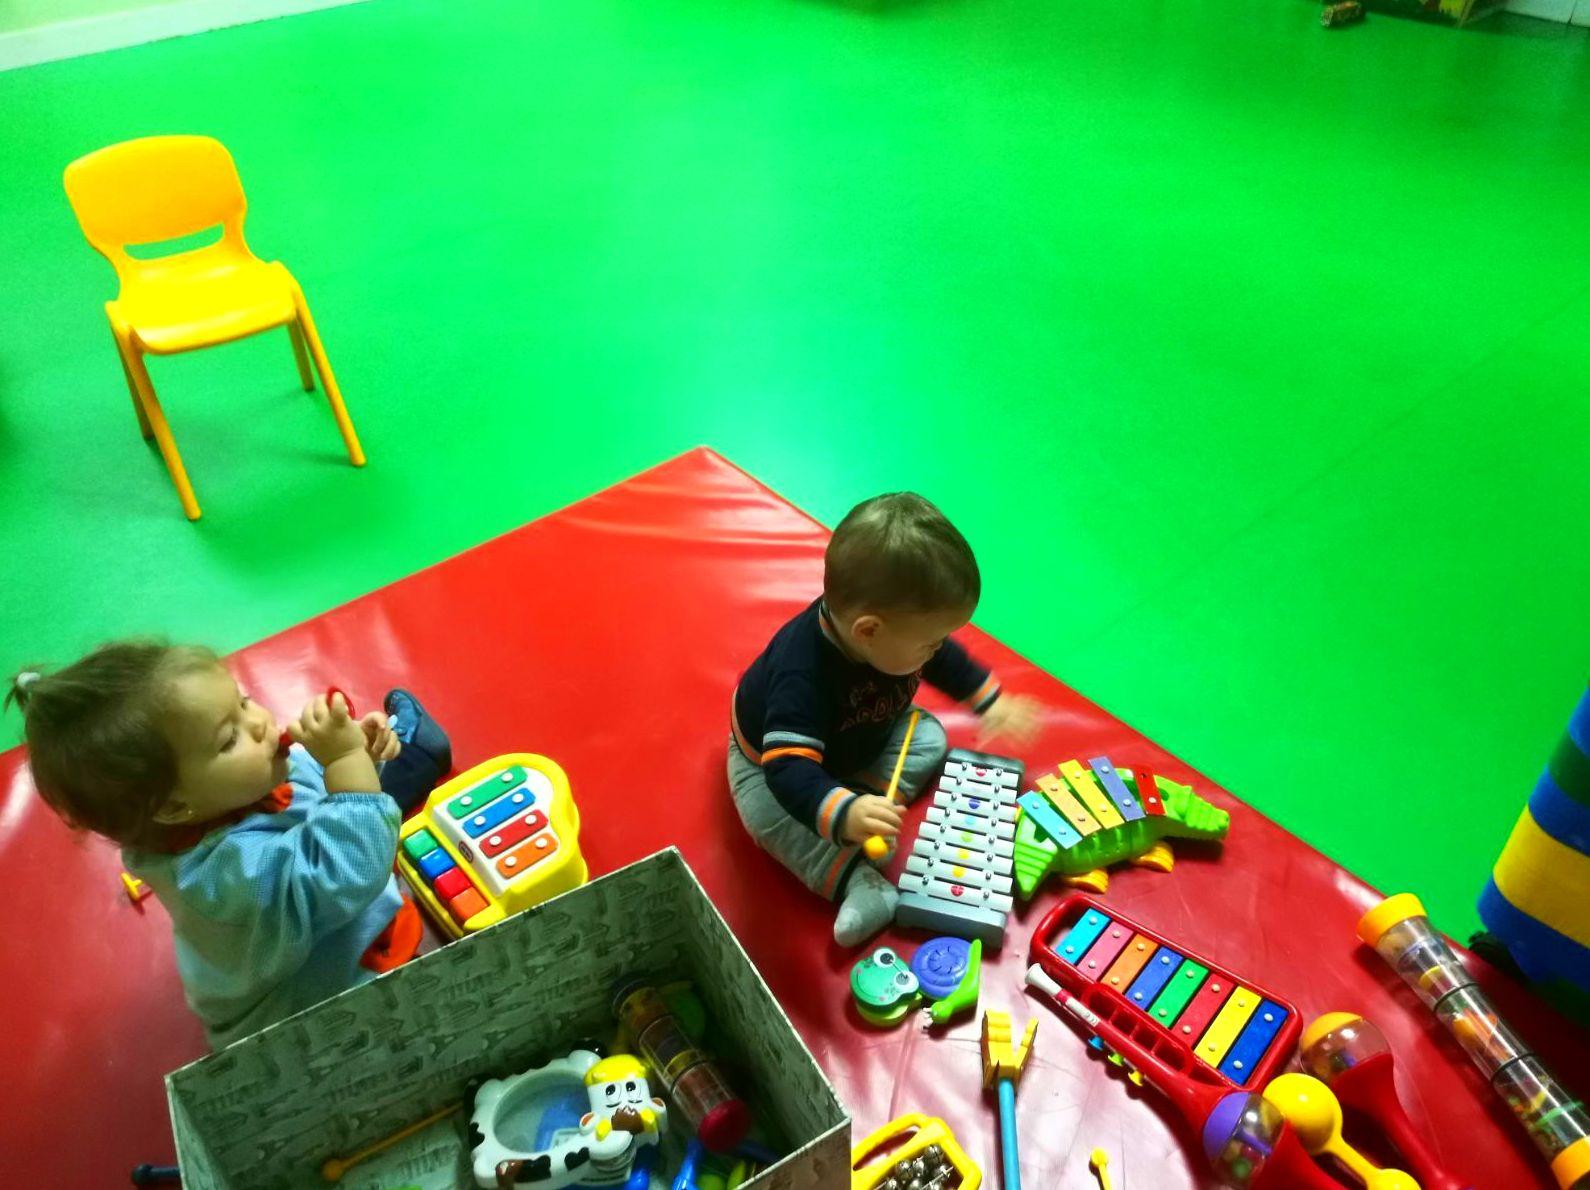 Foto 22 de Escuela infantil en Algete | E.I. Cuatro Pecas de Colores